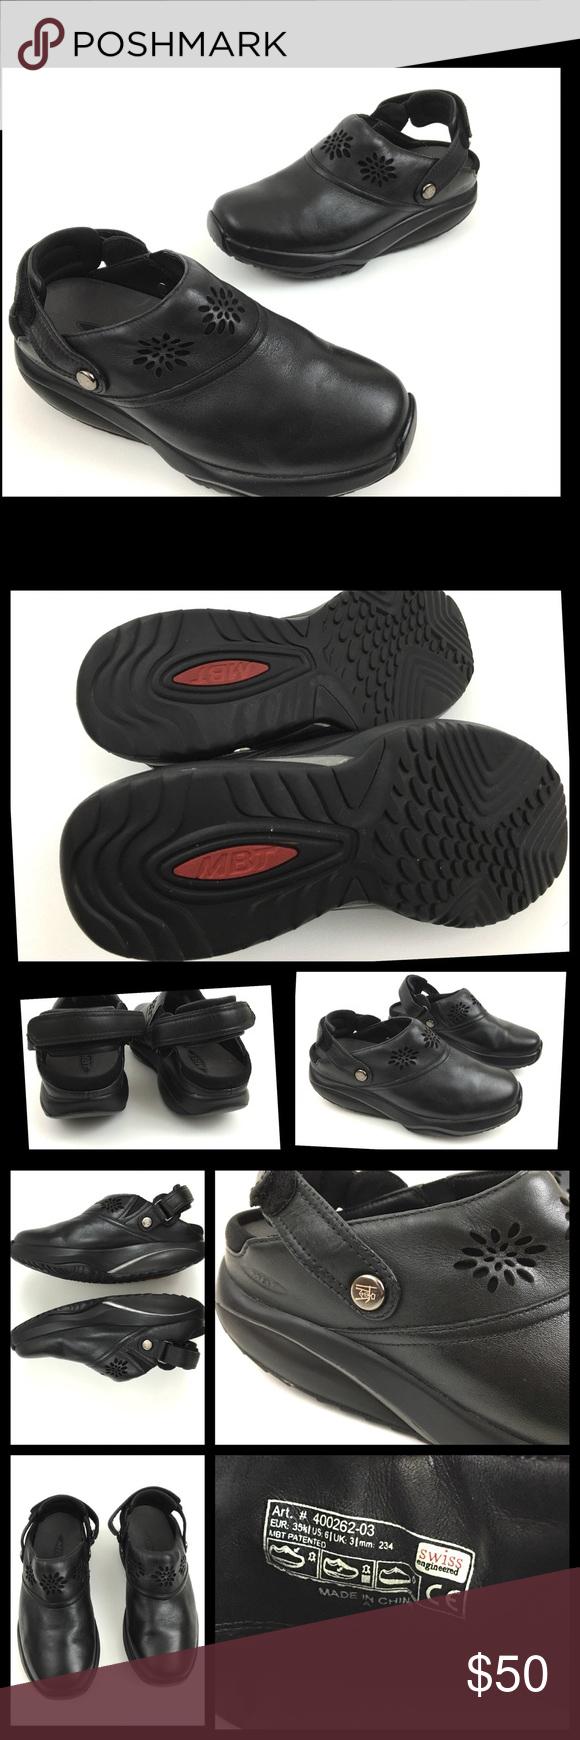 41d5d6ce2e02 MBT Kipimo Black Leather Mule Shoes MBT Kipimo Black Leather Slip On Mule Shoes  Women s Size 6 Nice Pre Owned Shoes